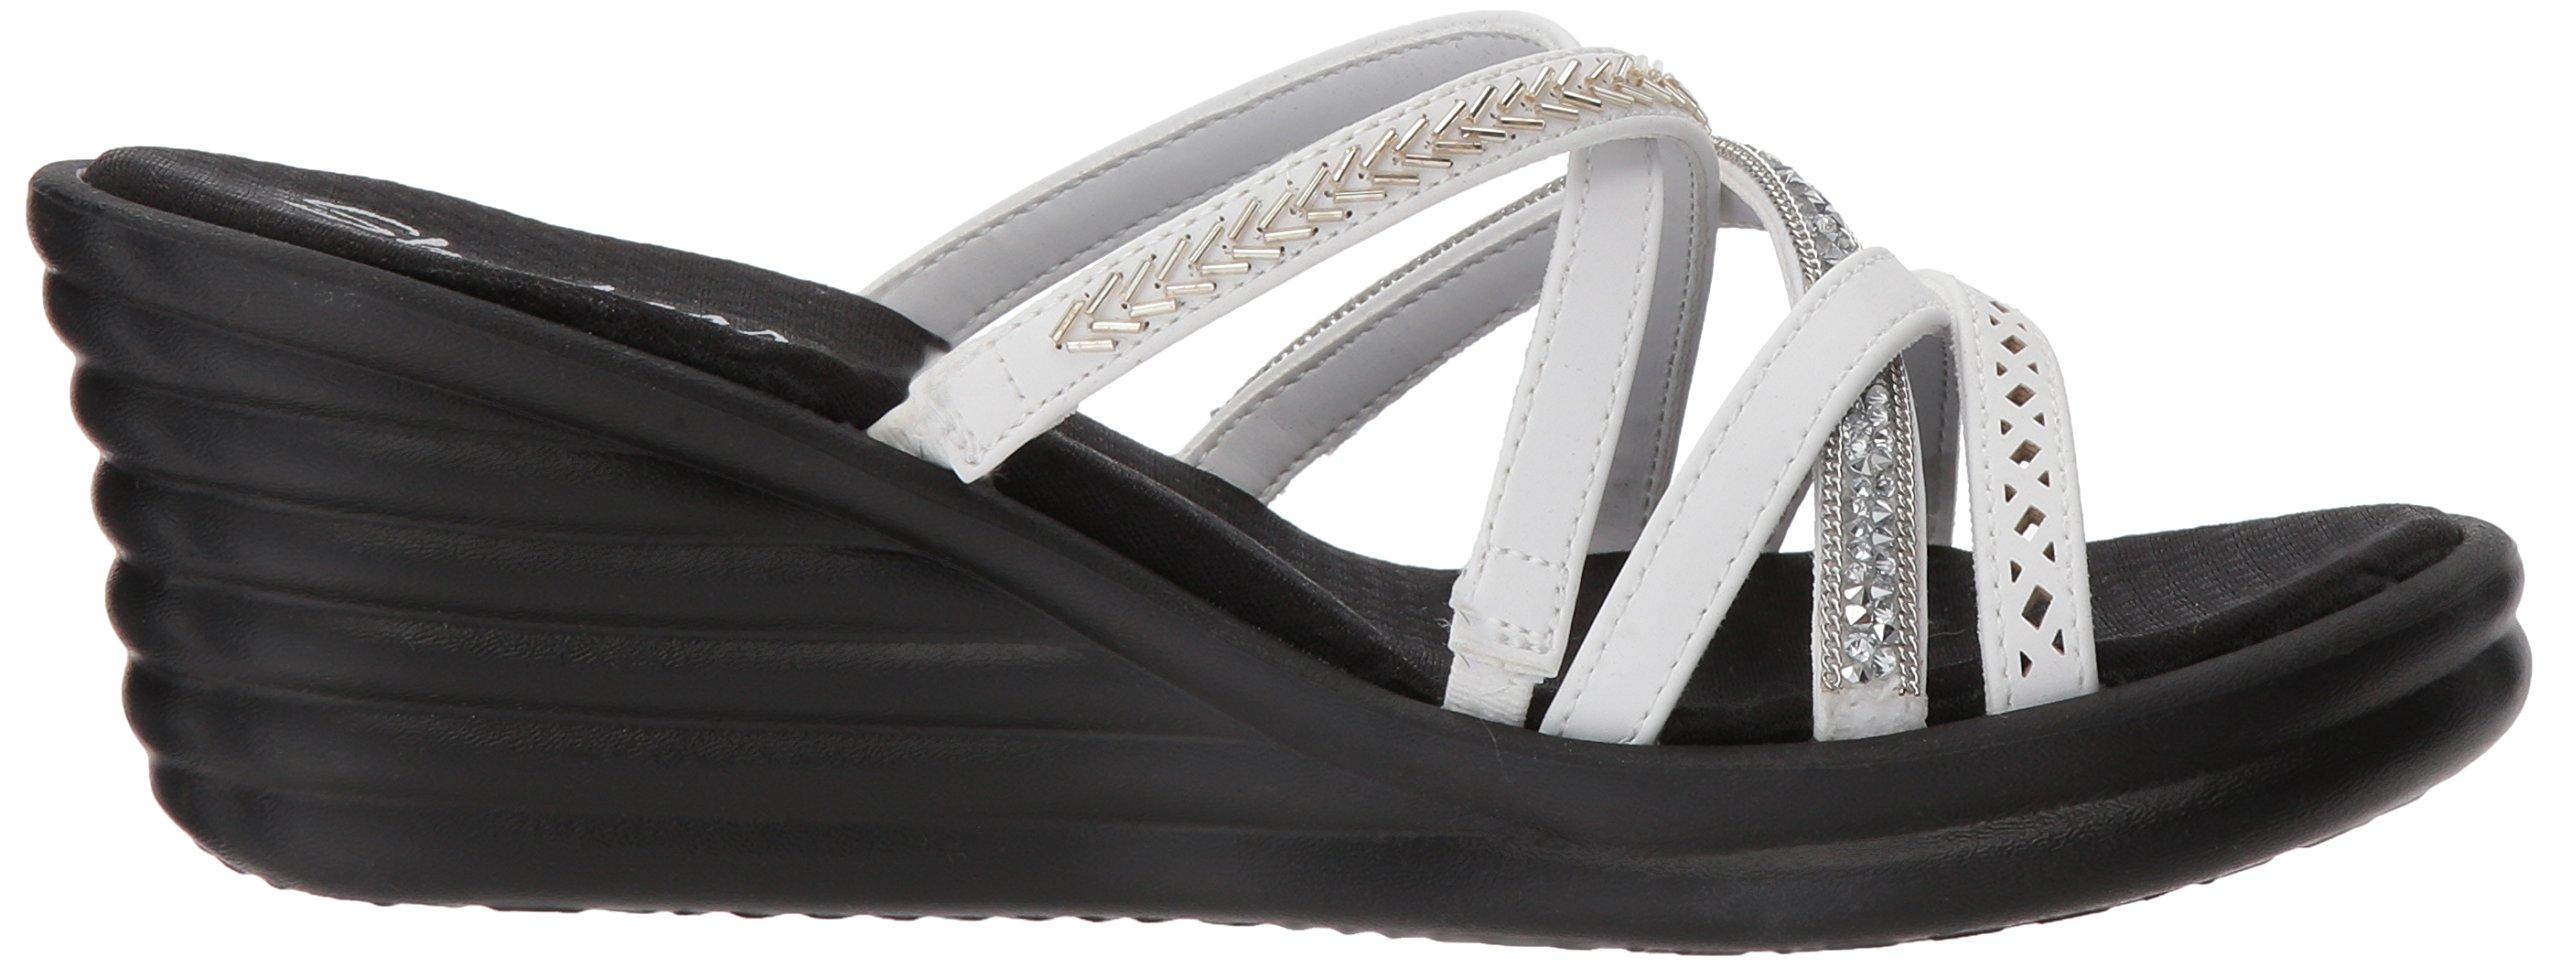 e305de462a53 Skechers Cali Women s Rumbler Wave-New Lassie Slide Sandal